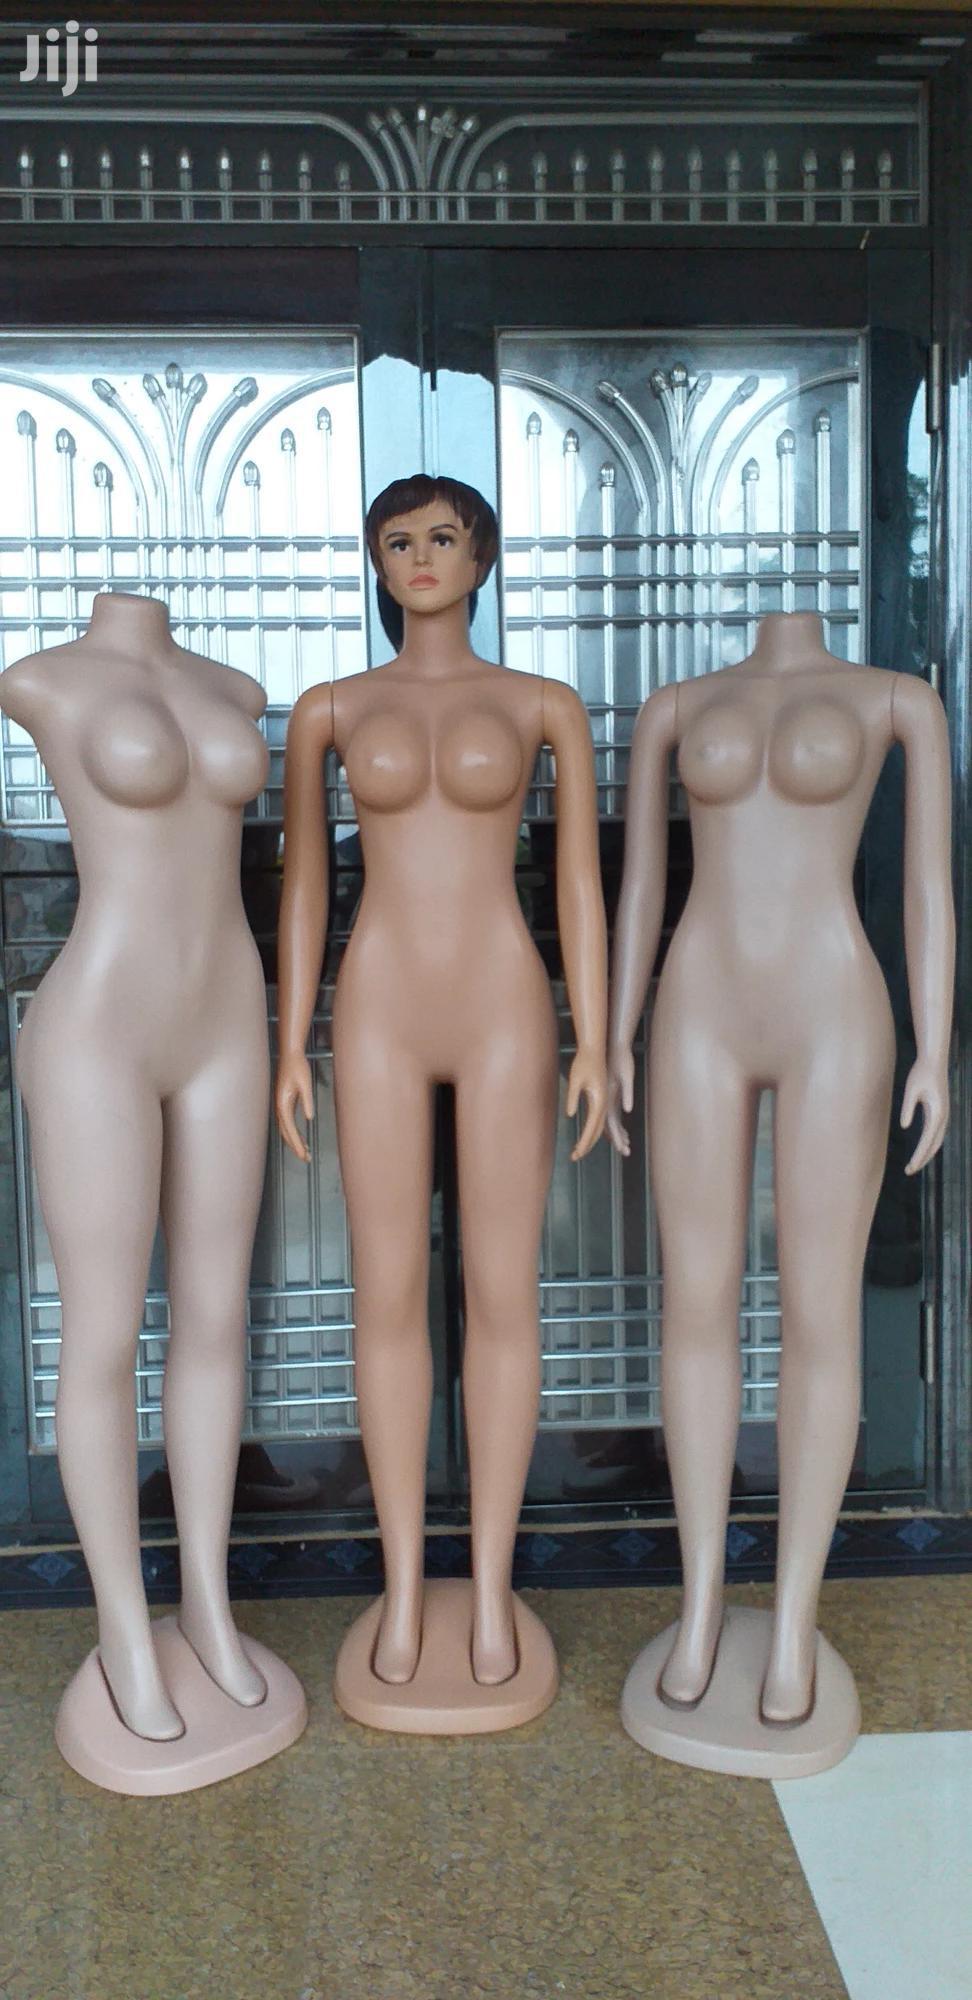 Archive: Female Mannequins